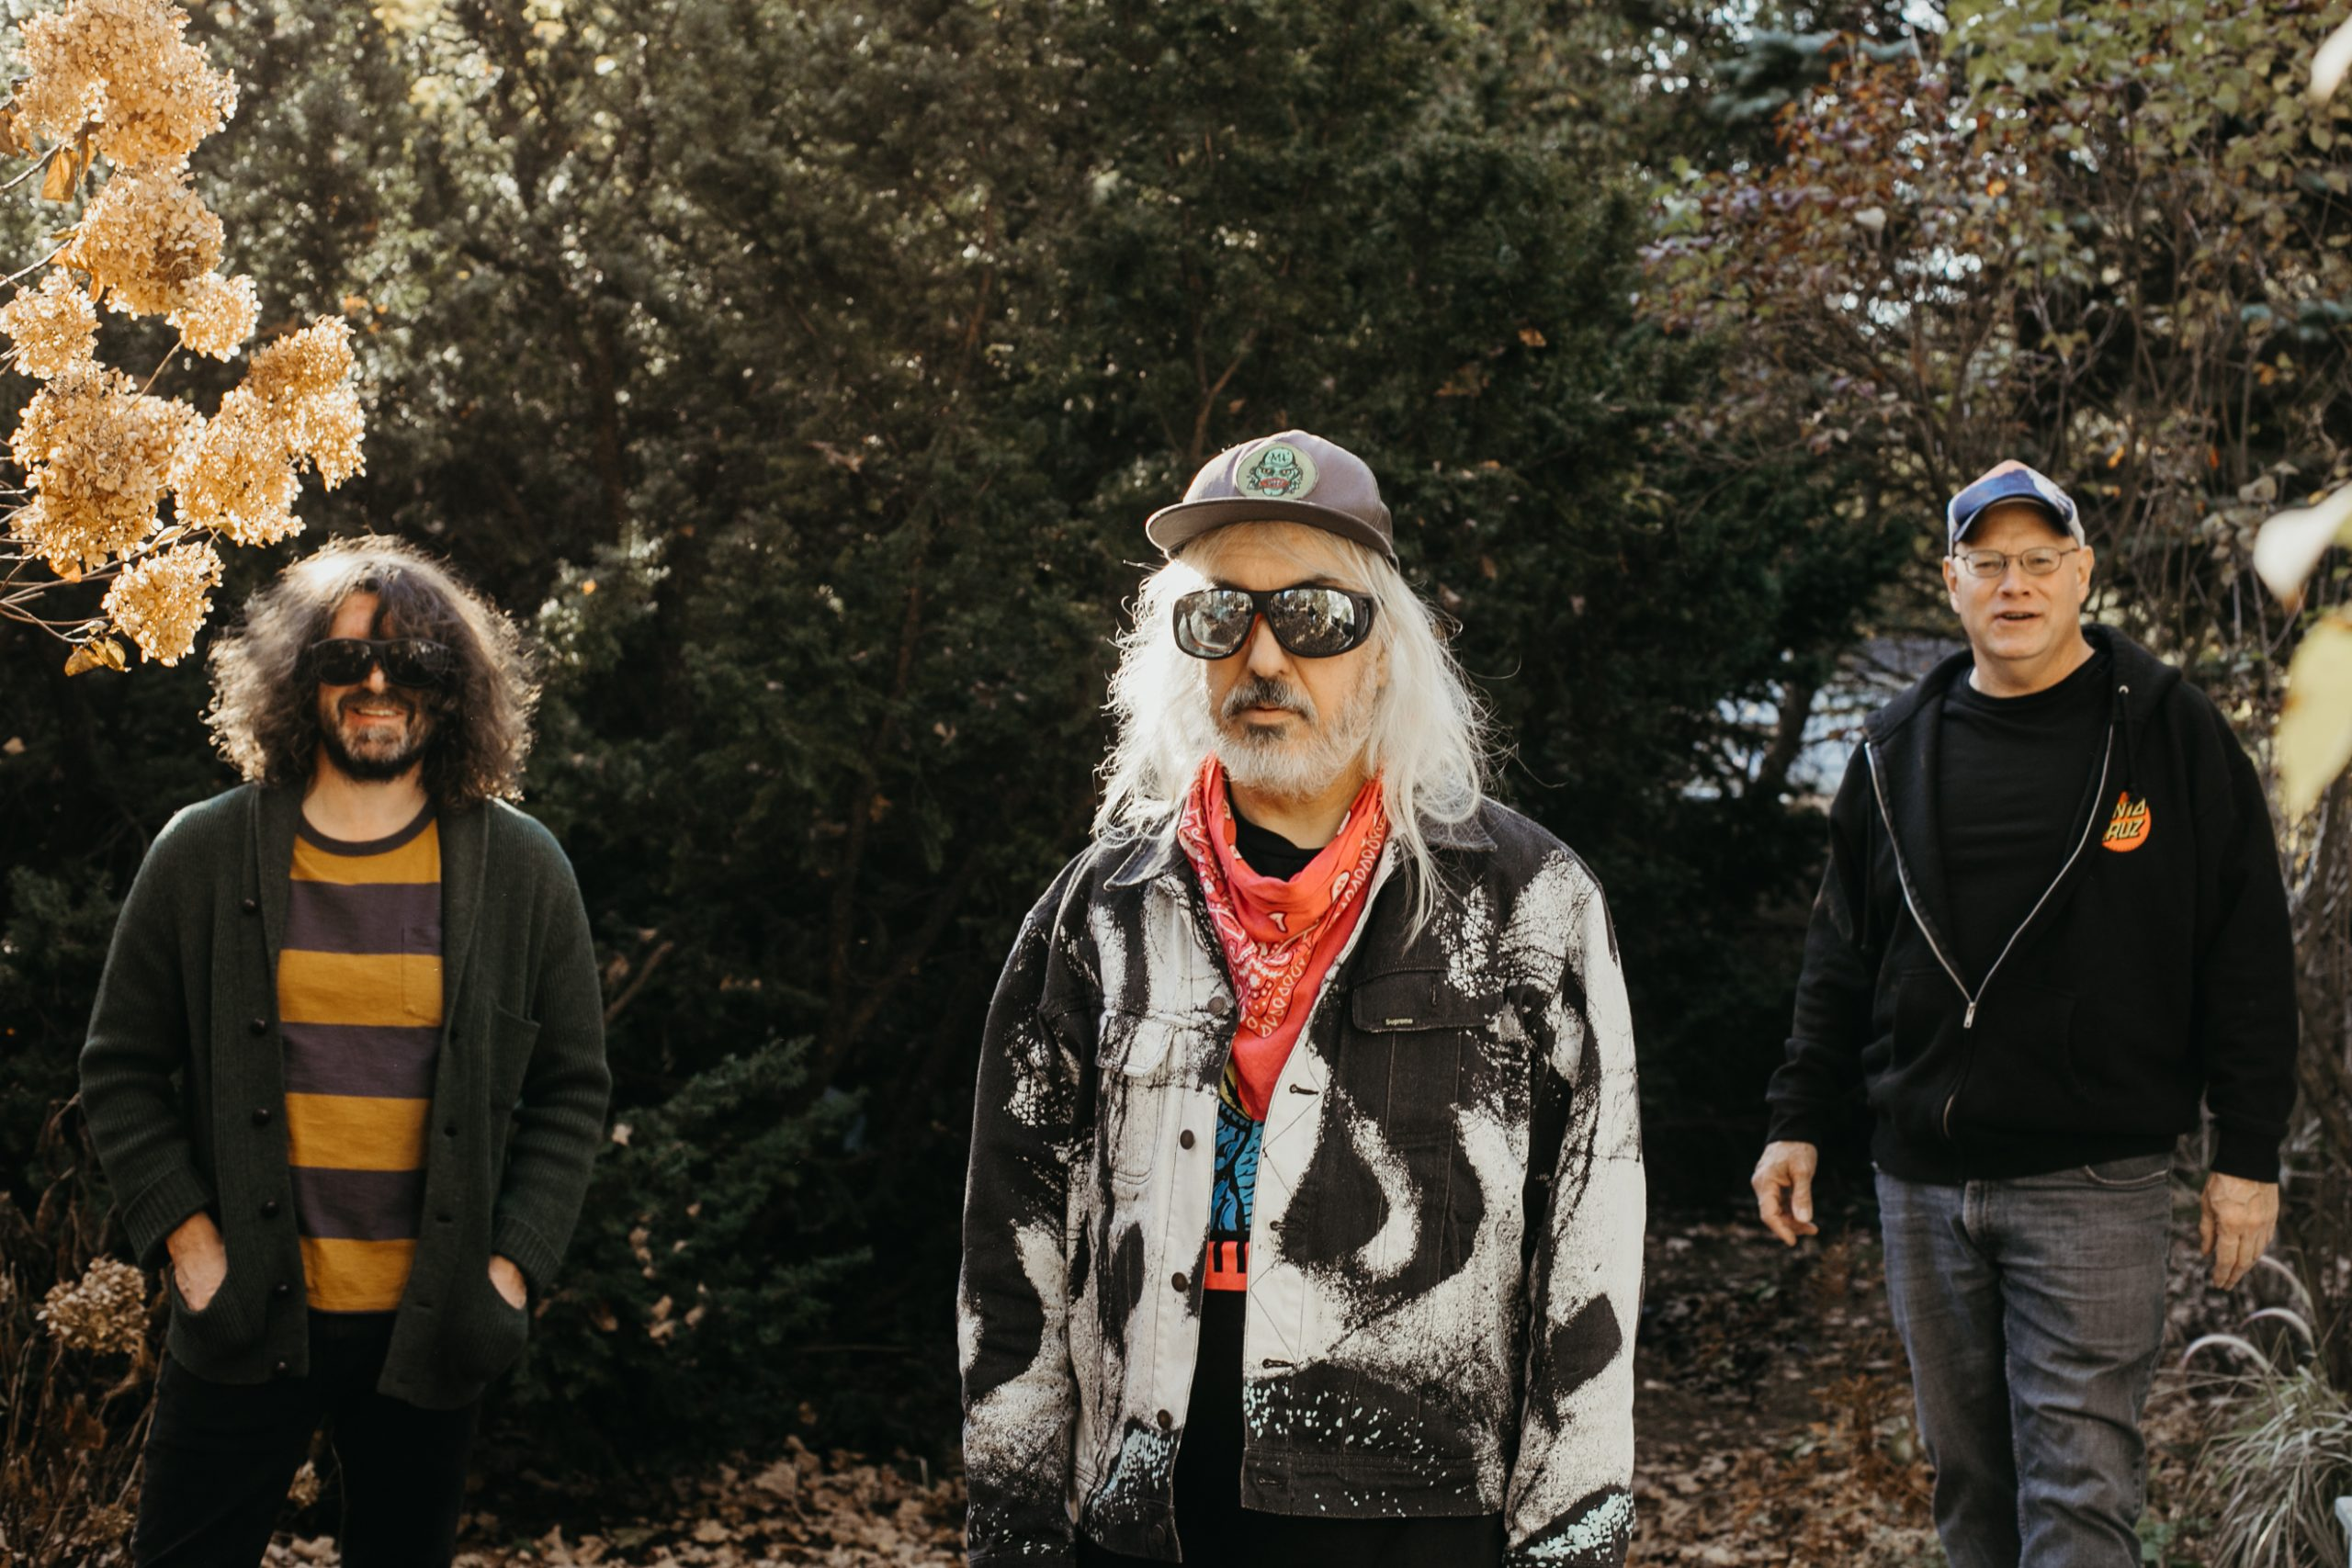 Left to right, Lou Barlow, J Mascis and Murph of Dinosaur Jr. (Courtesy Cara Totman)